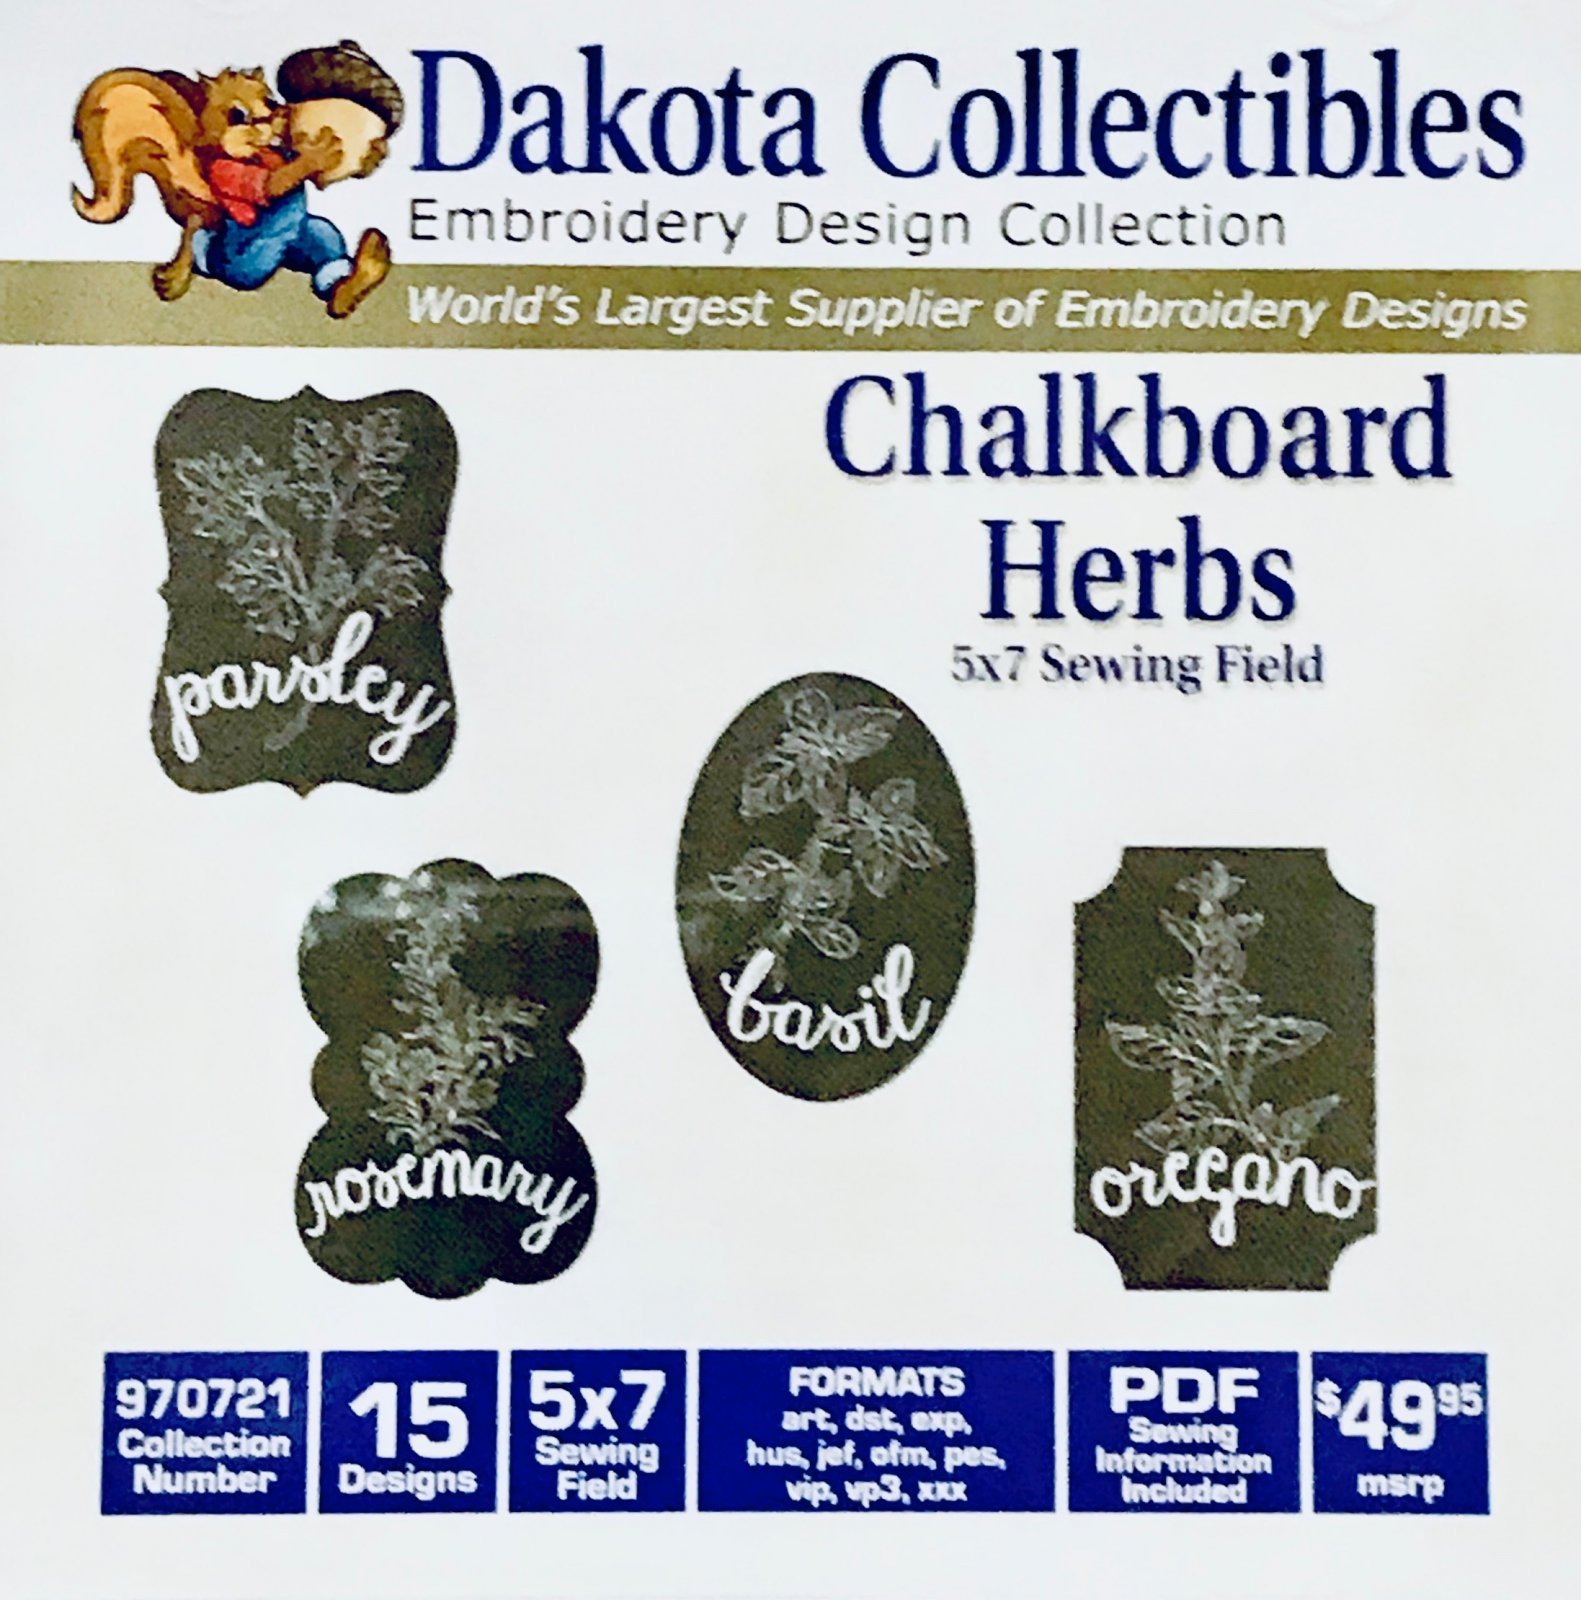 Chalkboard Herbs 970721